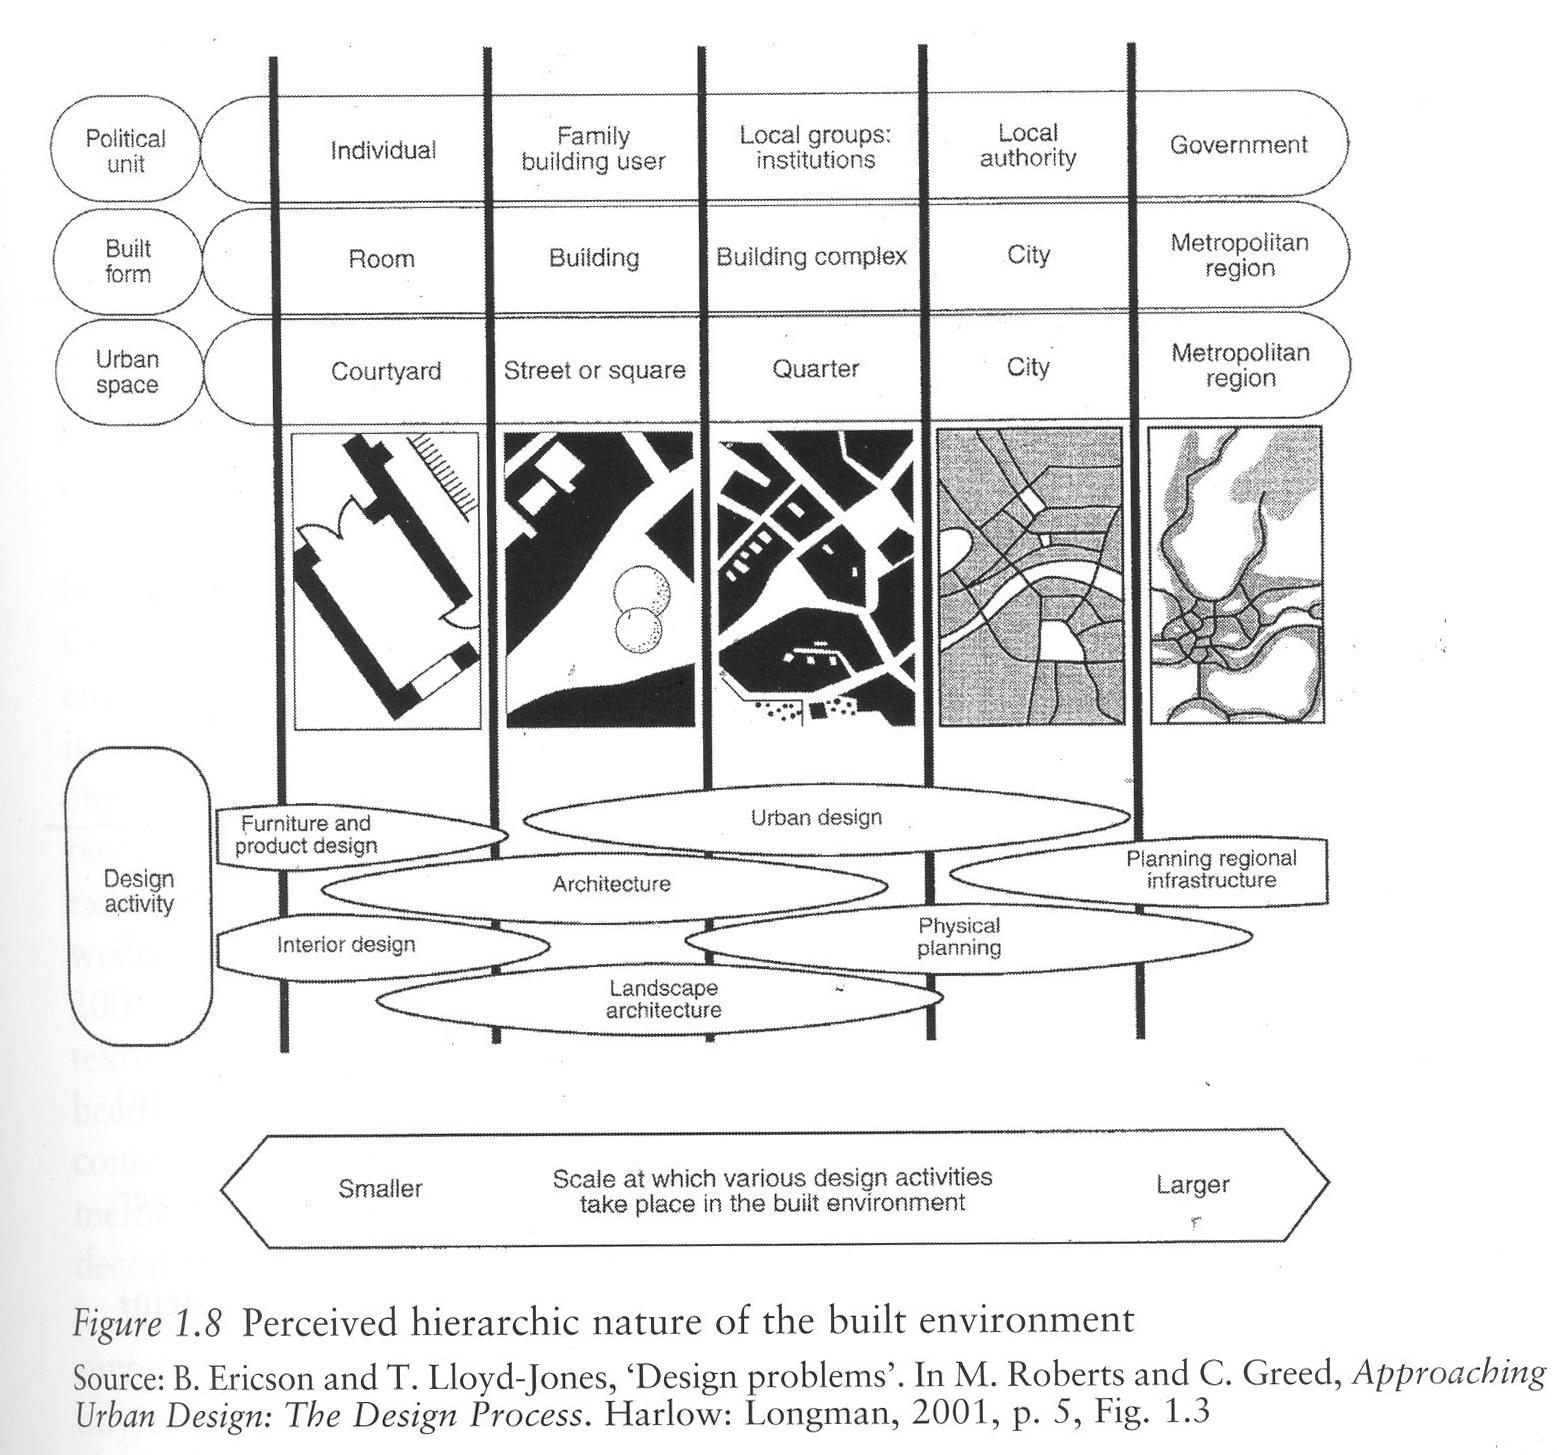 Alexander Cuthbert On Urban Design Methodology